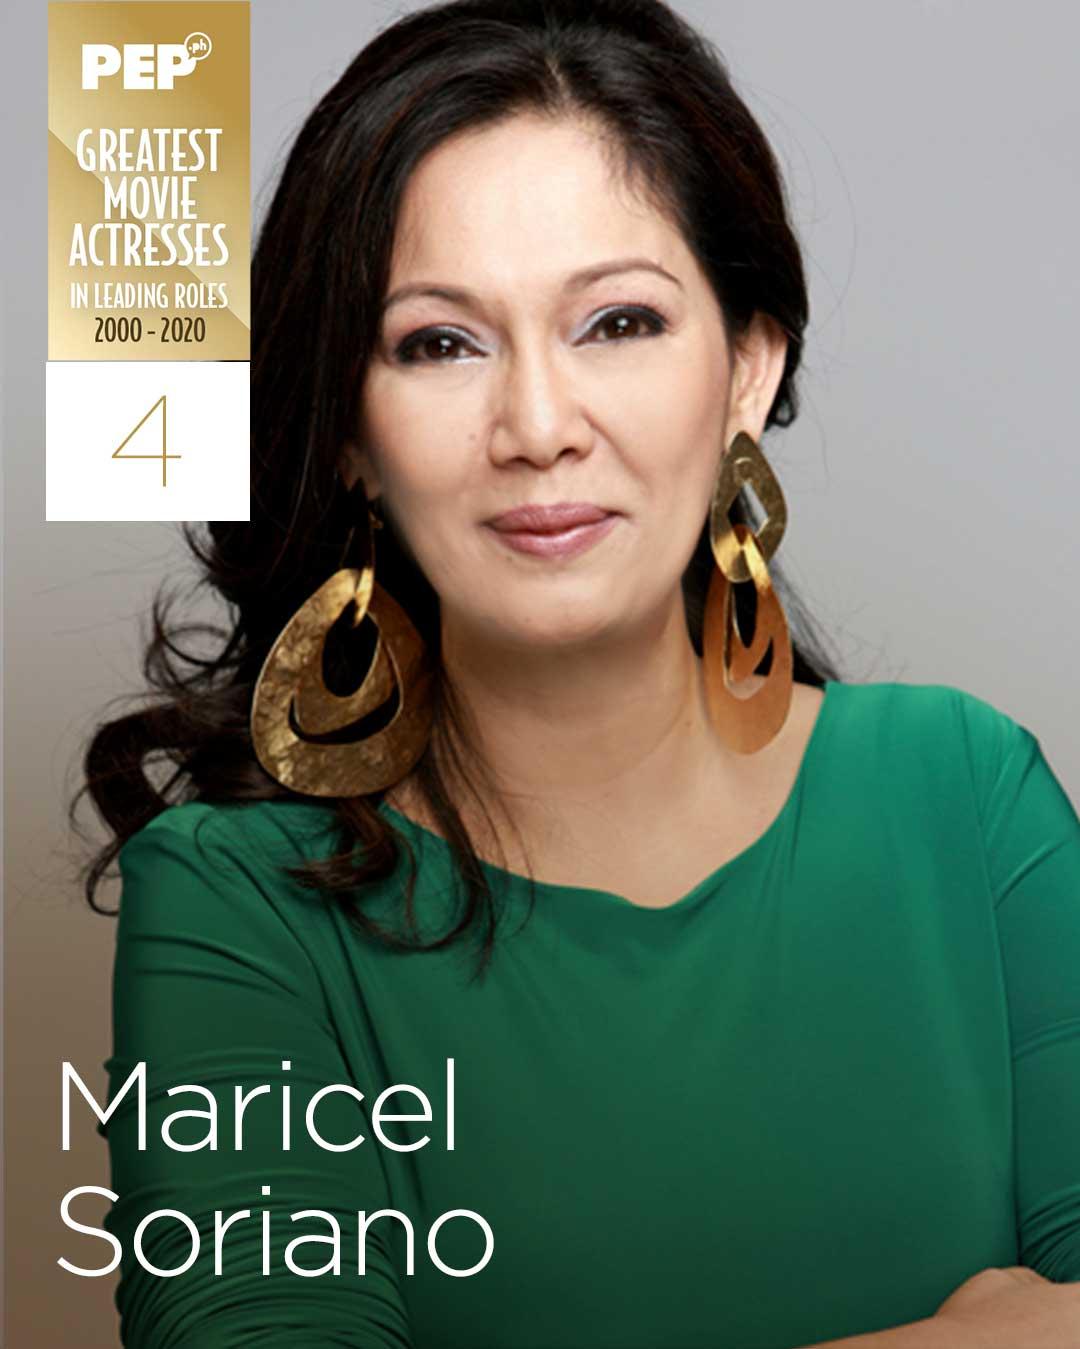 Maricel Soriano, 15 Greatest Actresses